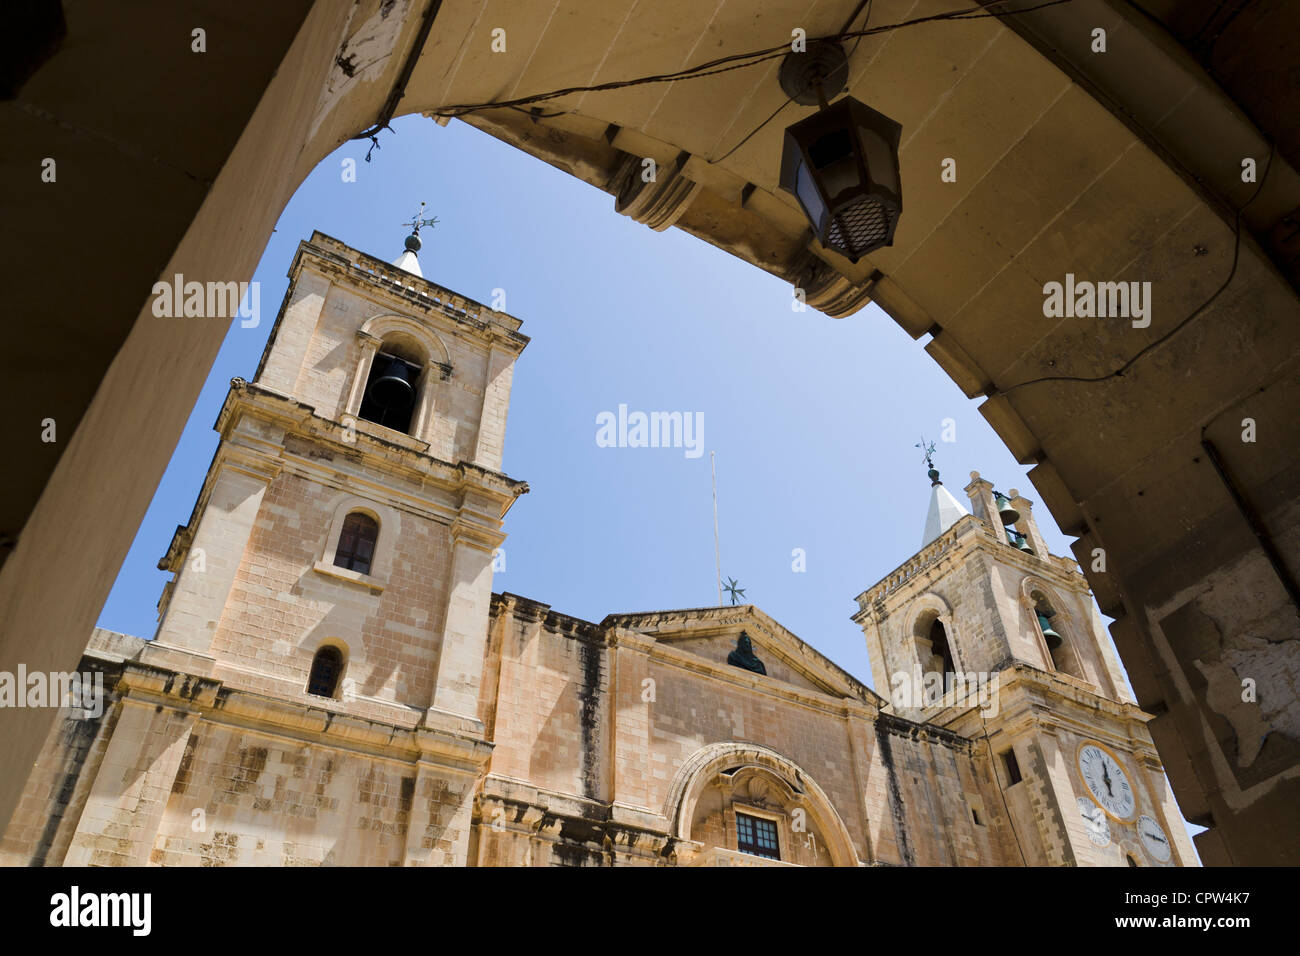 St. John's Co-Cathedral, Valletta, Malta - Stock Image